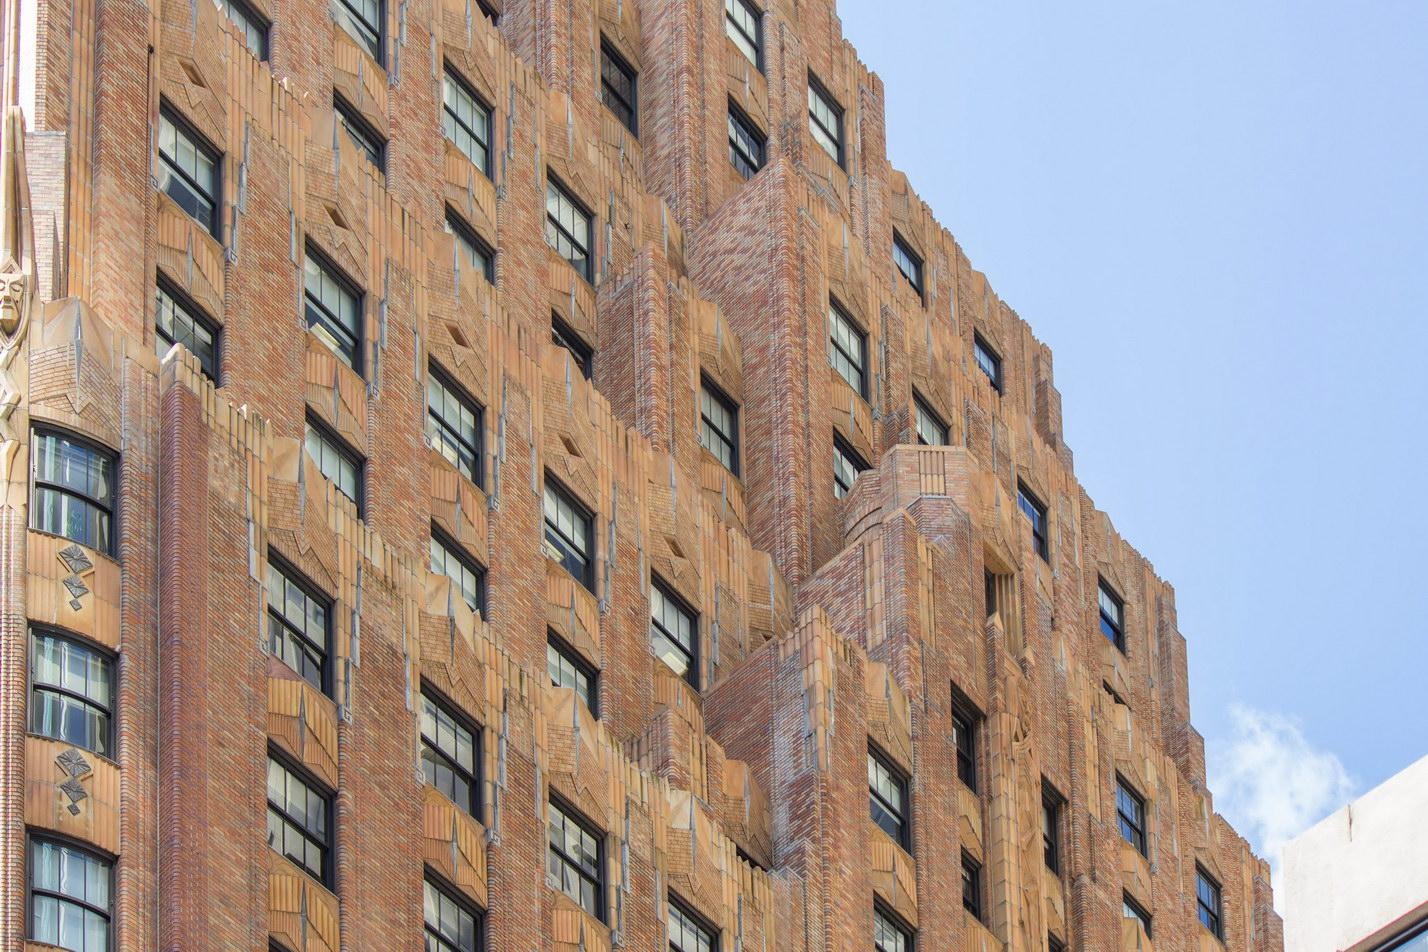 [General Electric Building] K_1639 [9/10/2012 11:58:39 AM]